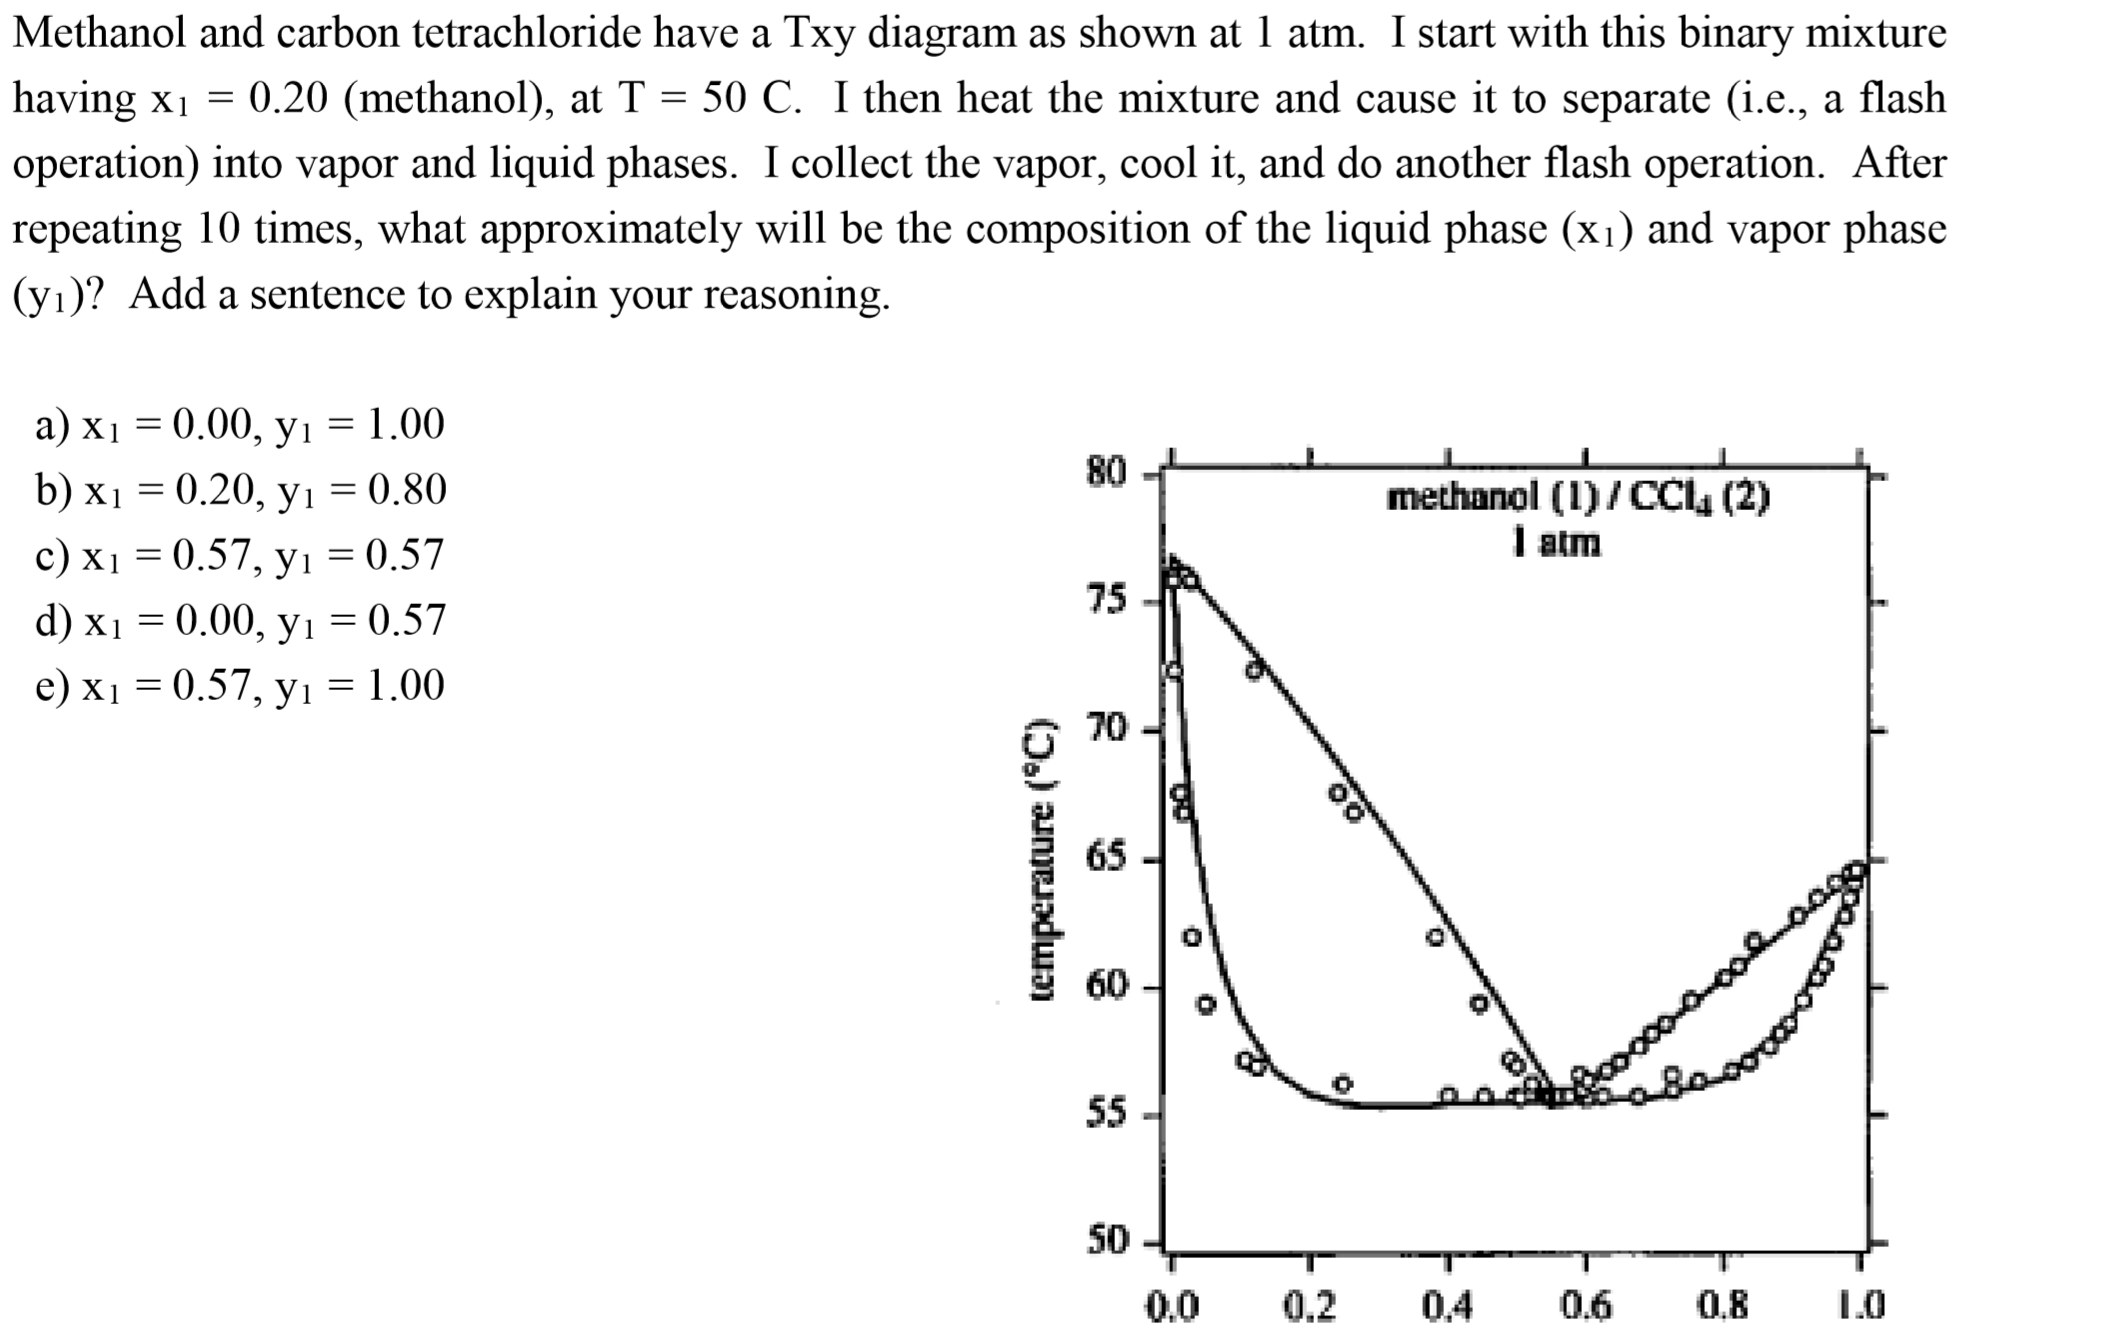 liquid controller wiring diagram solved: methanol and carbon tetrachloride have a txy diagr ... benzyl chloride liquid vapor phase diagram